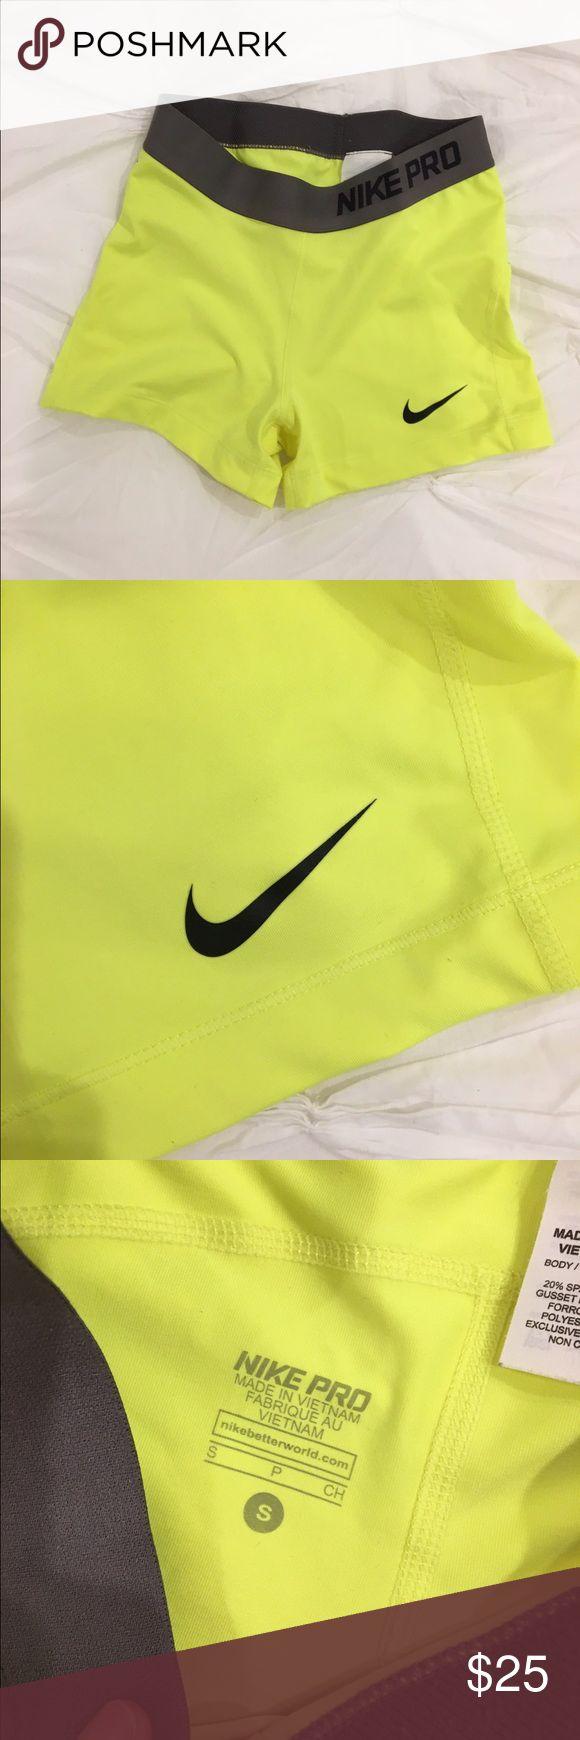 "Brand new never worn neon yellow Nike pro shorts. ""Tennis ball"" yellow, size small. Never worn, brand new :) Nike Shorts"